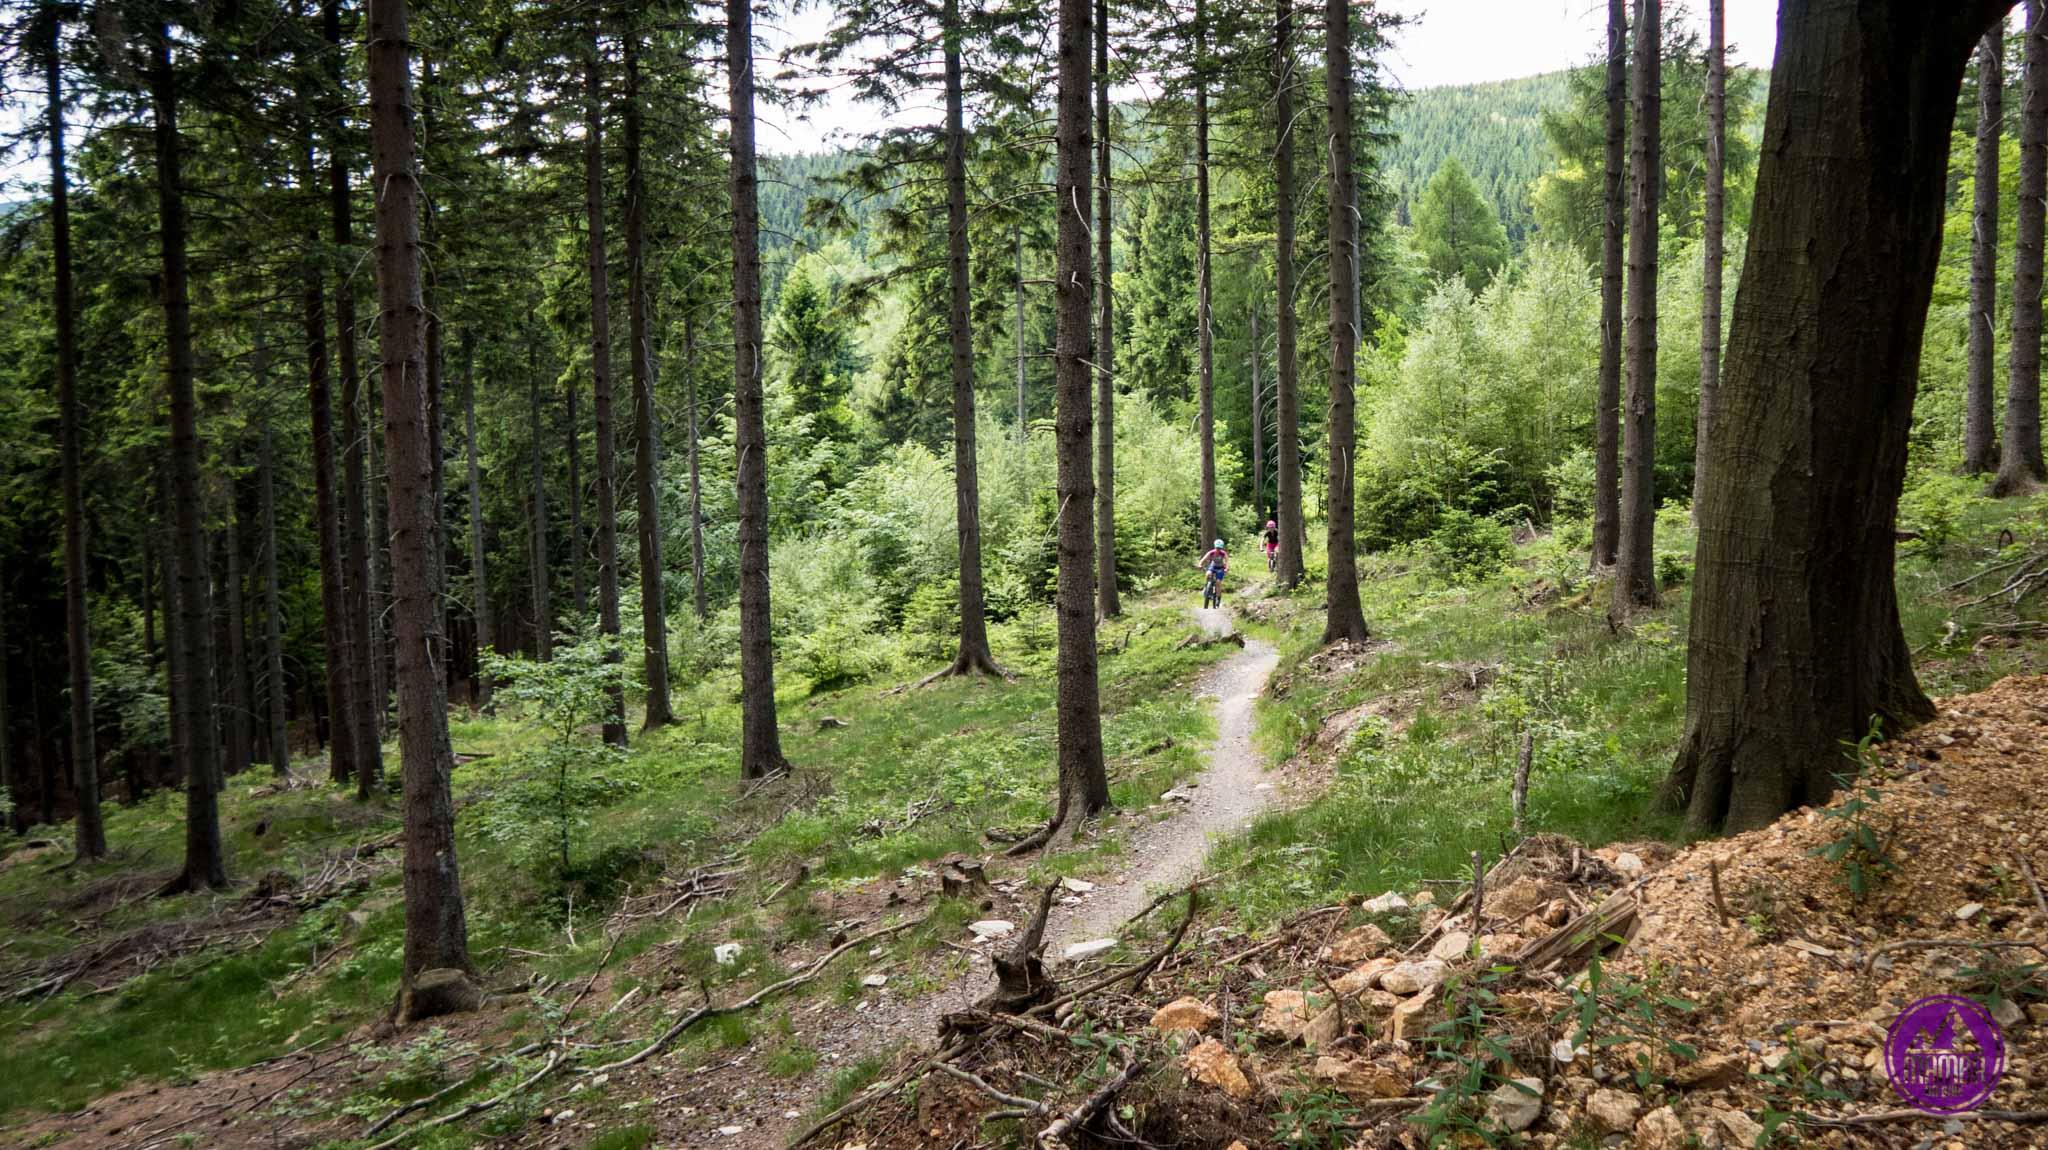 Singiel w lesie.